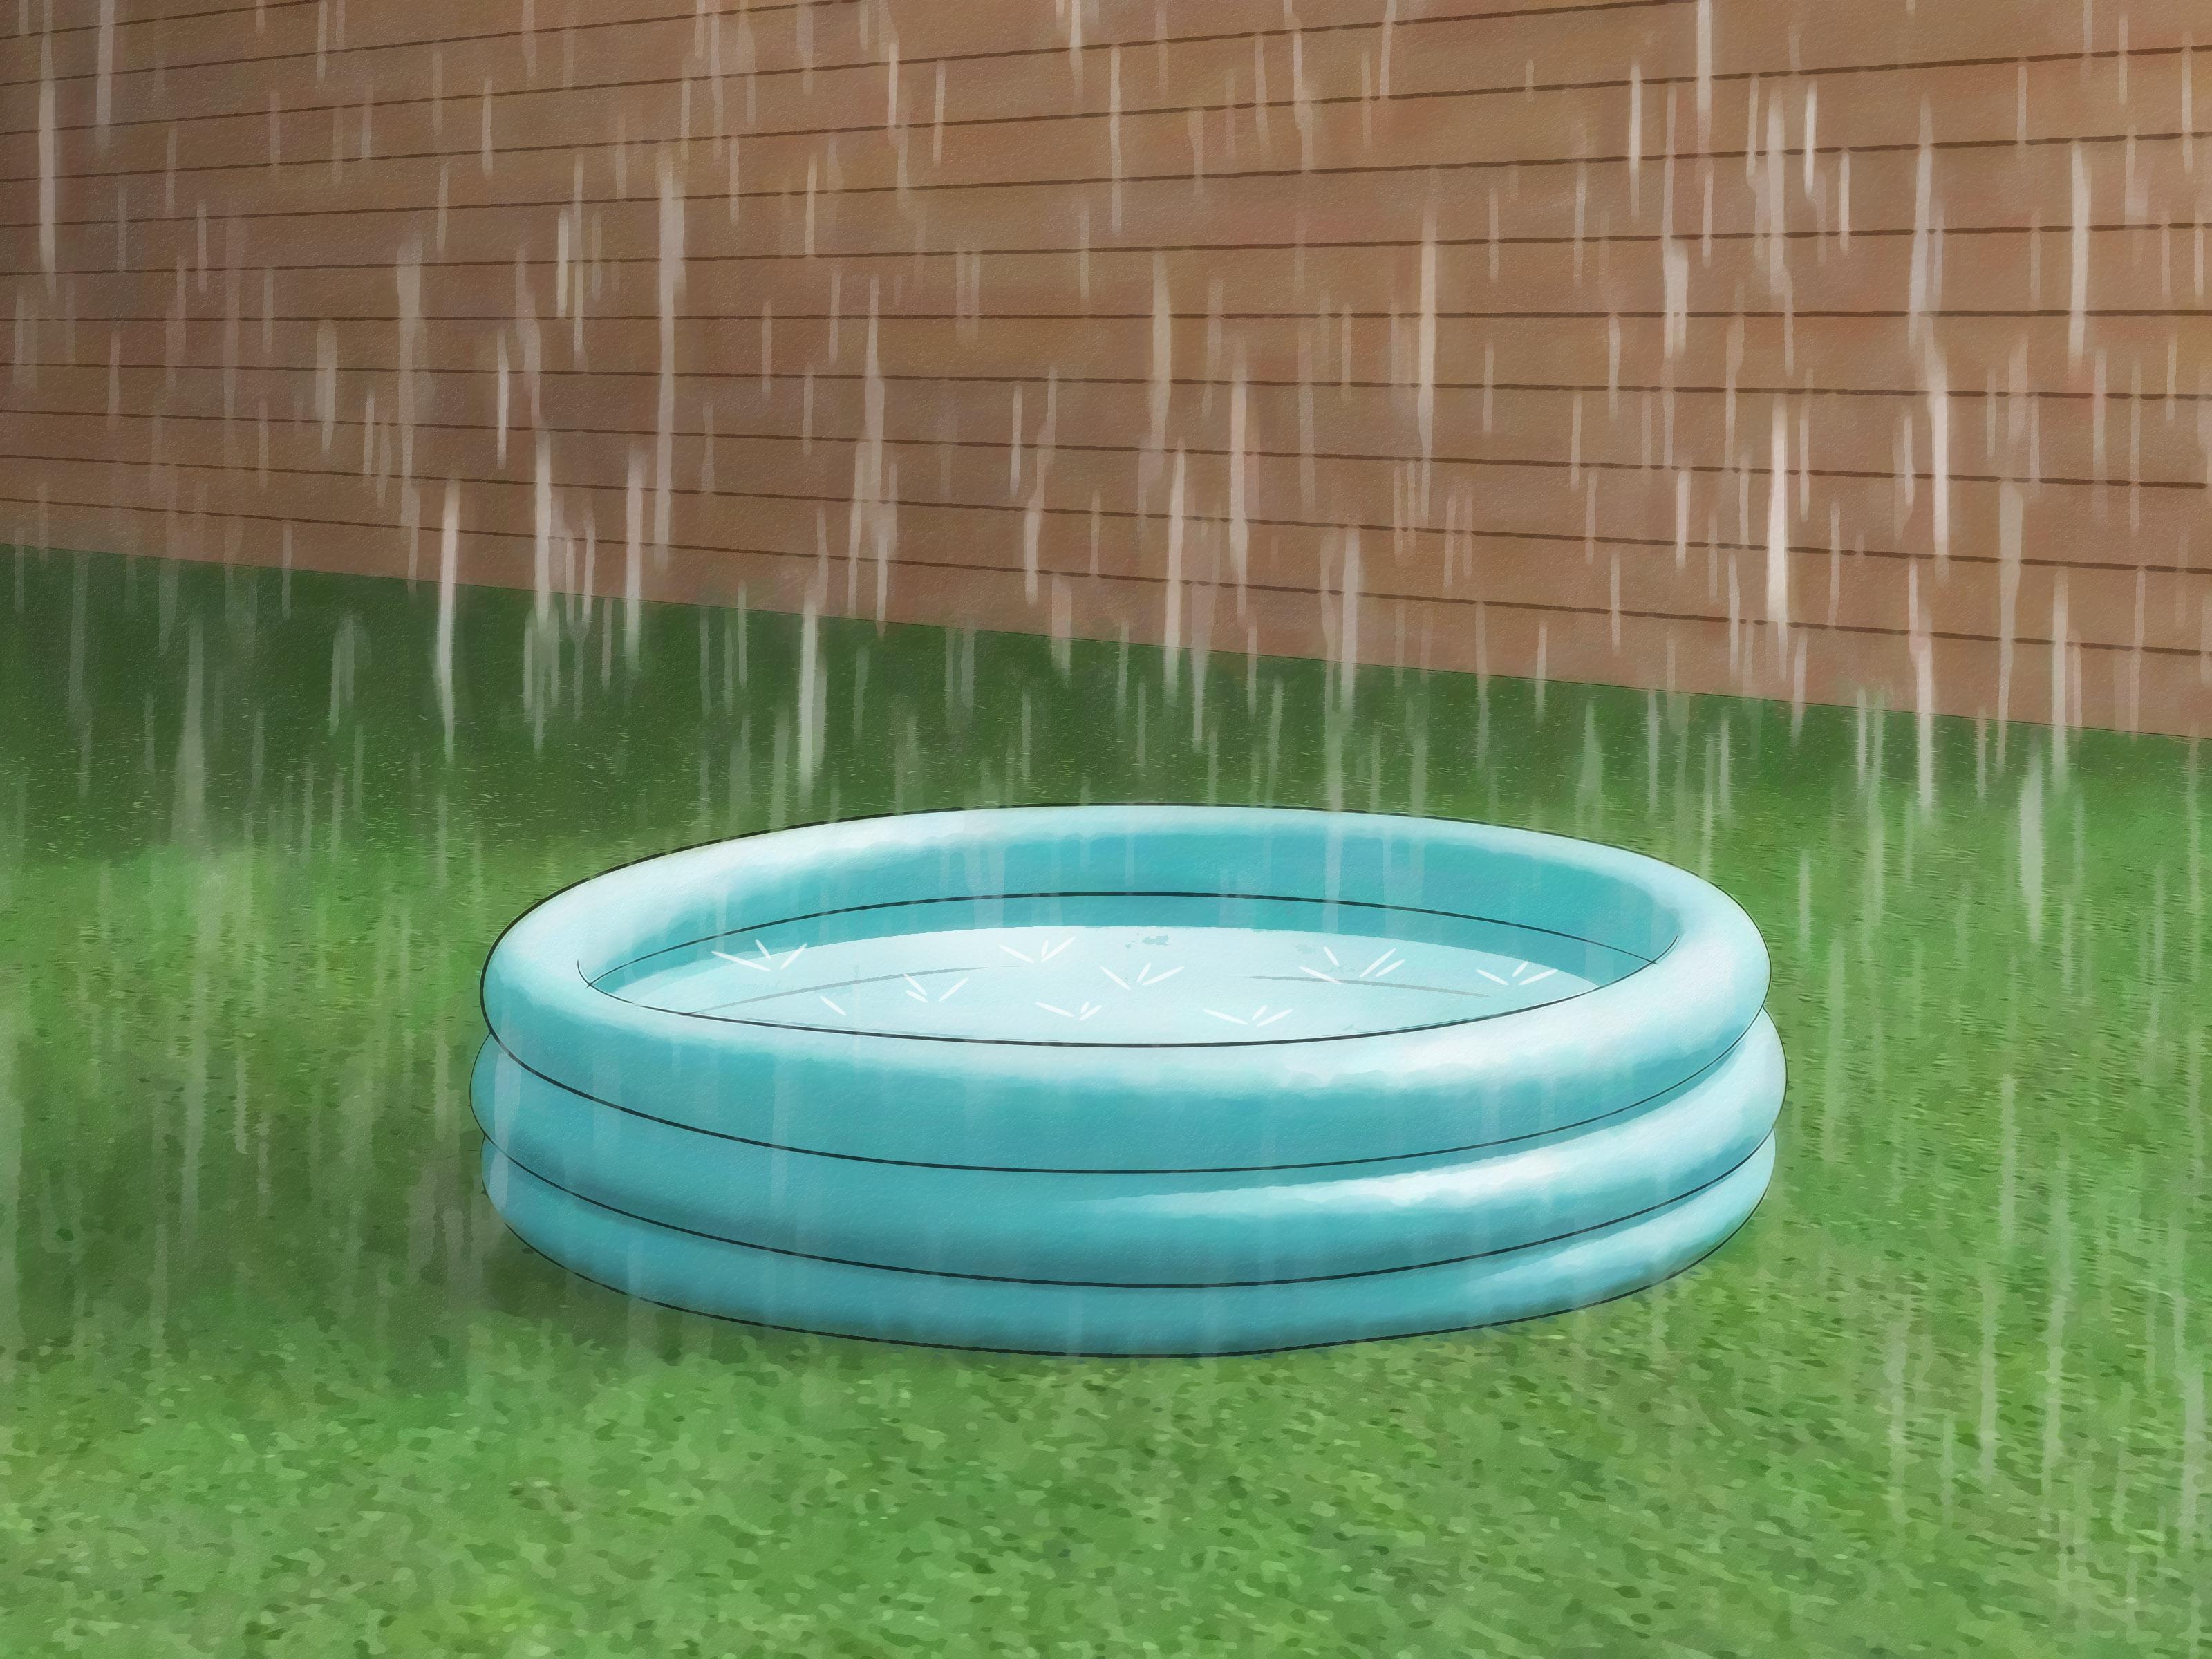 023 2439369275 Rainwater Harvesting Essay Wikipedia Save Water Awful Life In Tamil Gujarati Full